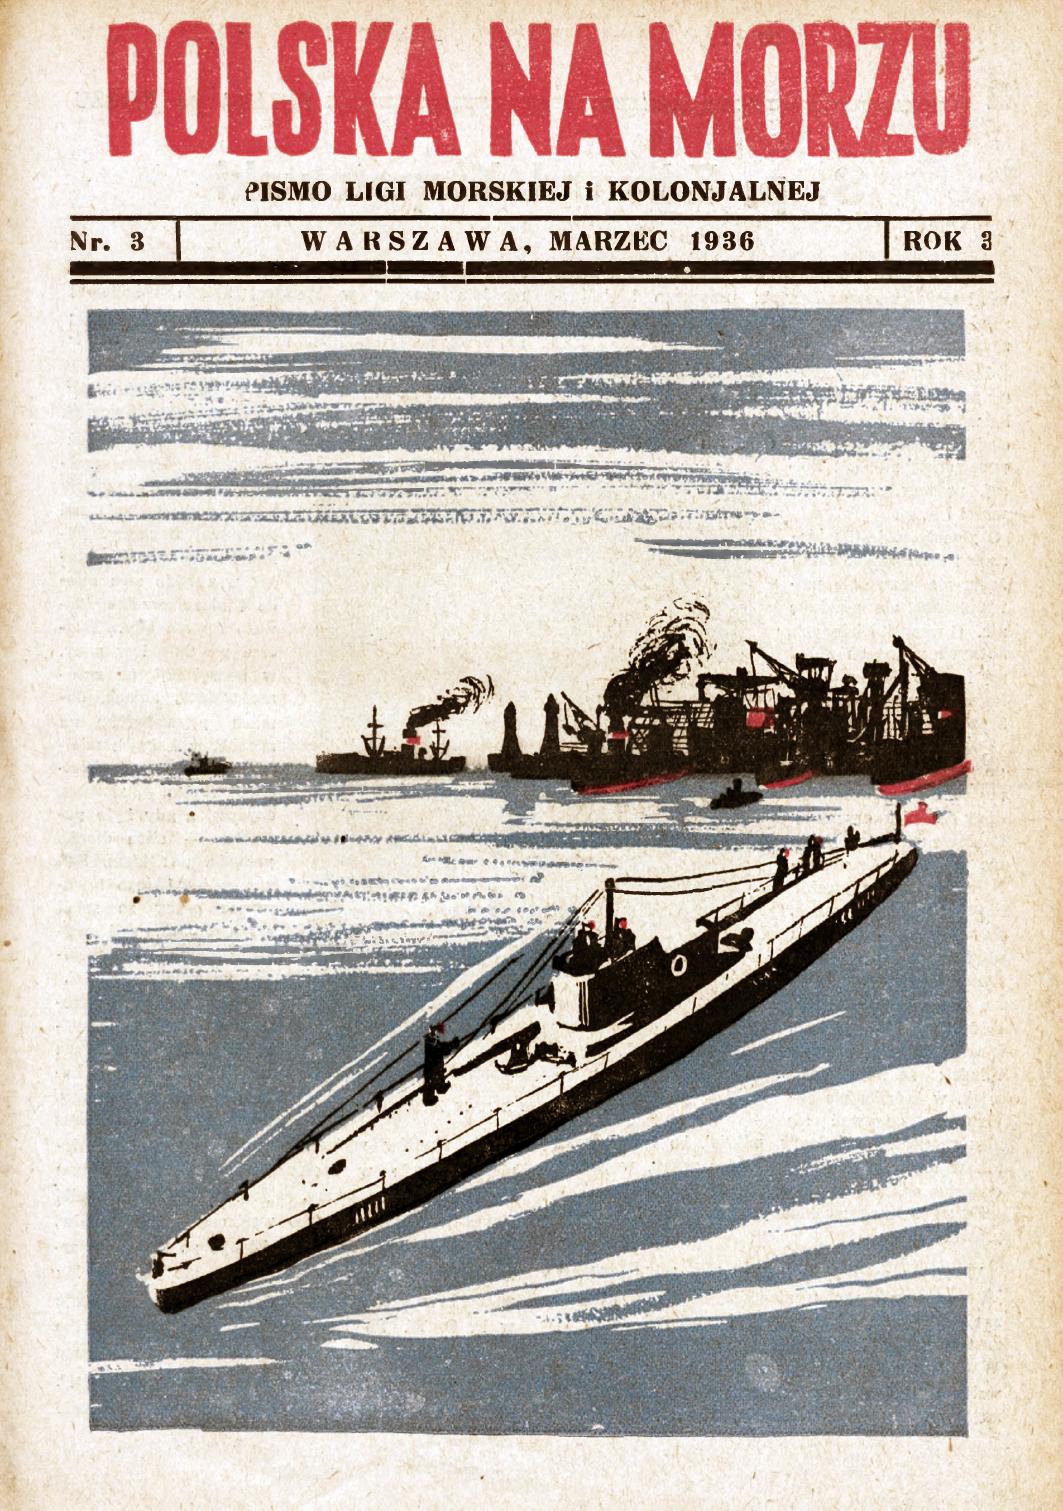 Polska na Morzu : pismo Ligi Morskiej i Kolonjalnej. - Liga Morska i Kolonjalna, 1936, nr 3